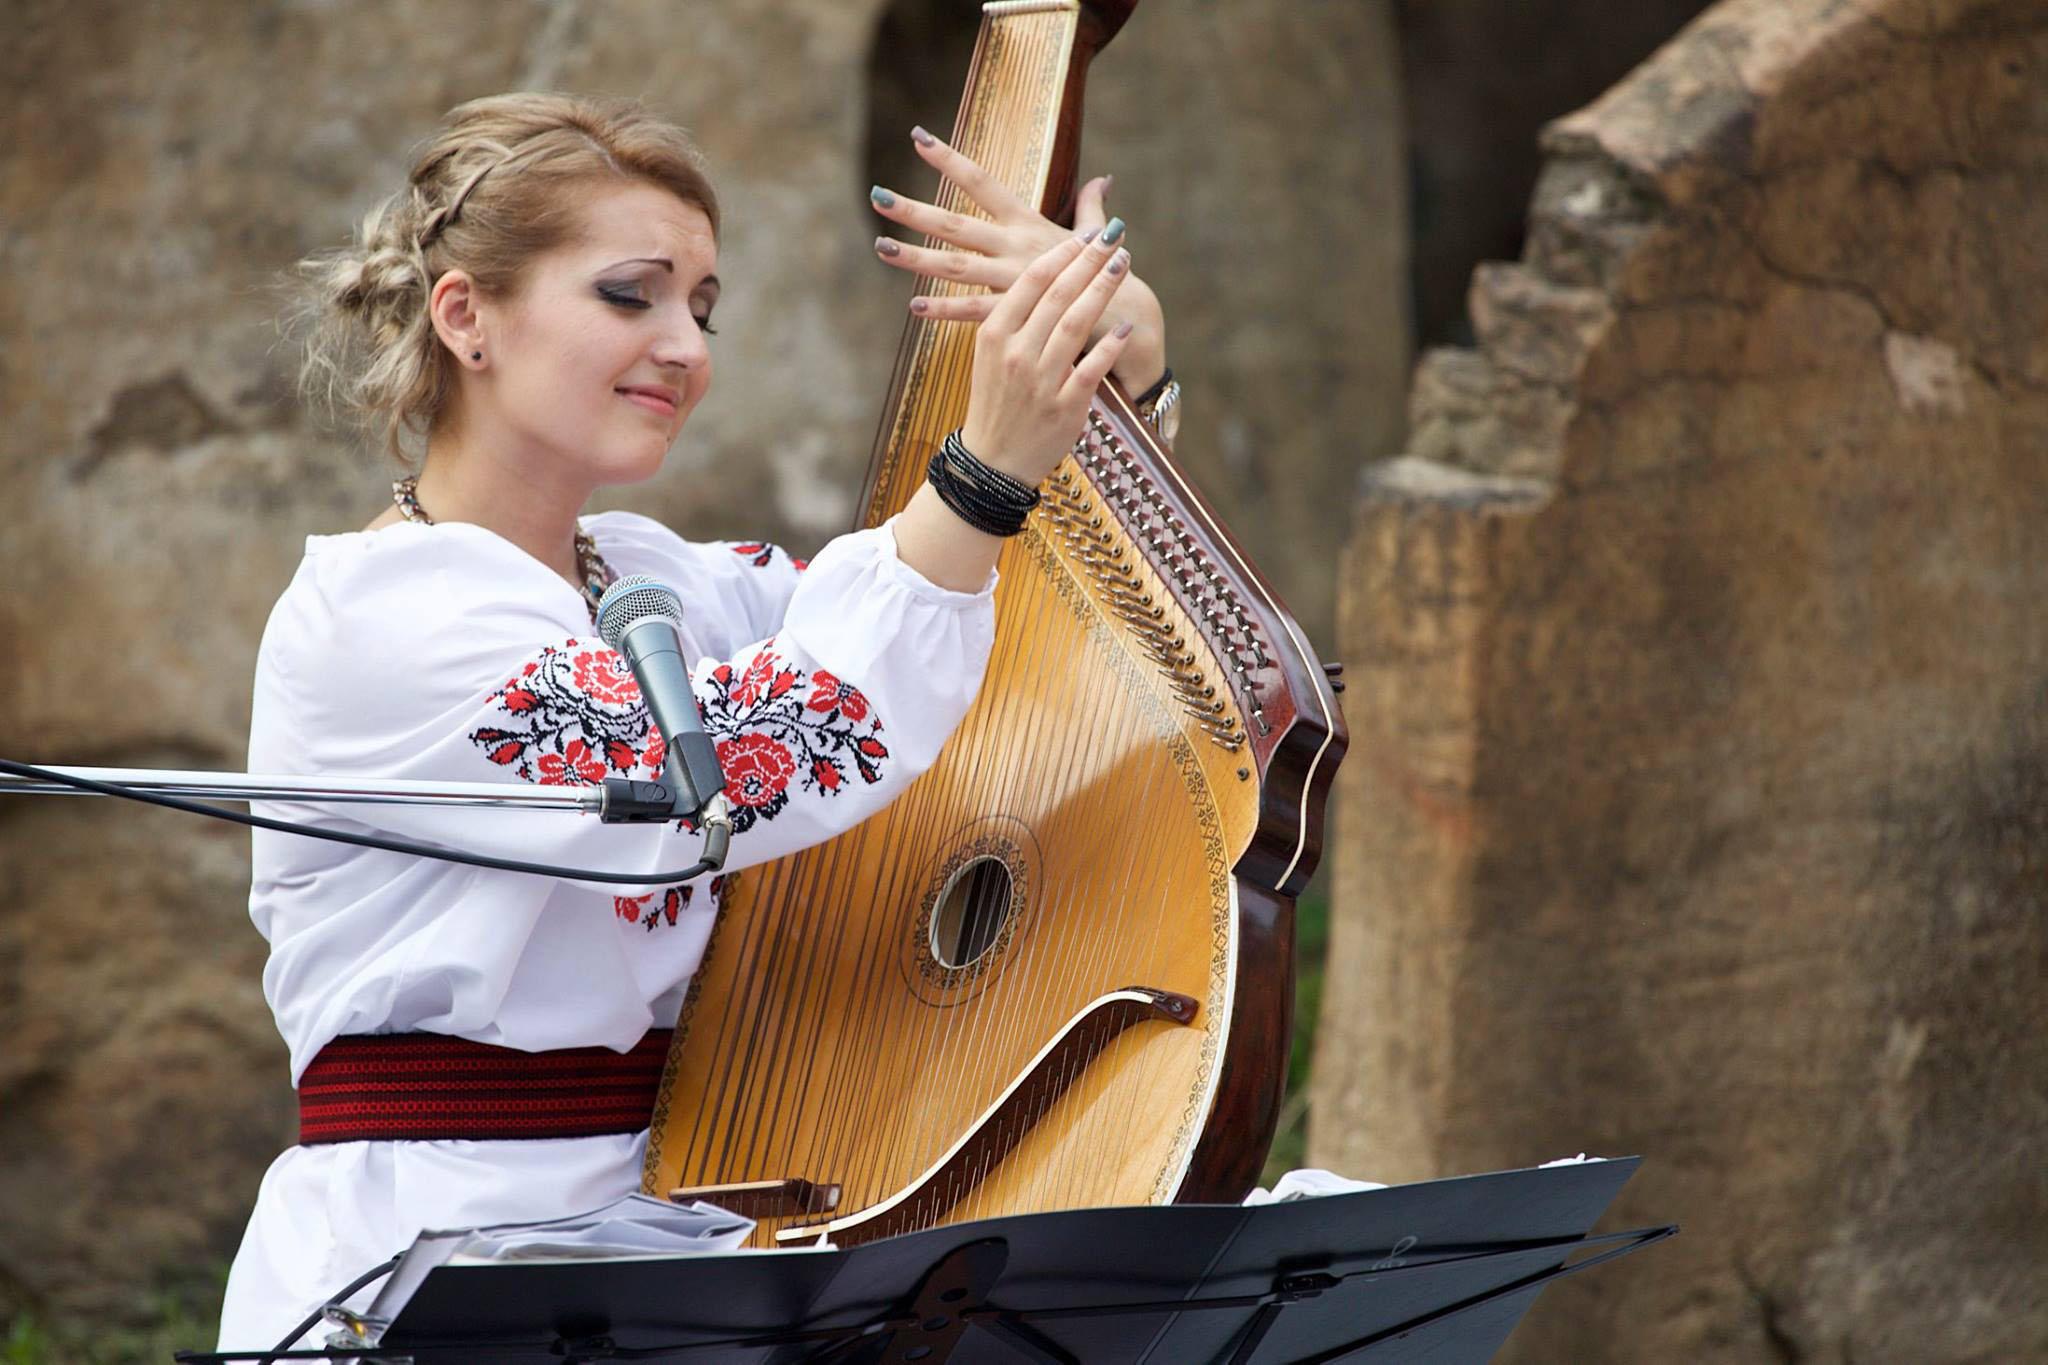 Kateryna(カテリーナ)ウクライナの歌姫・バンドゥーラ&歌